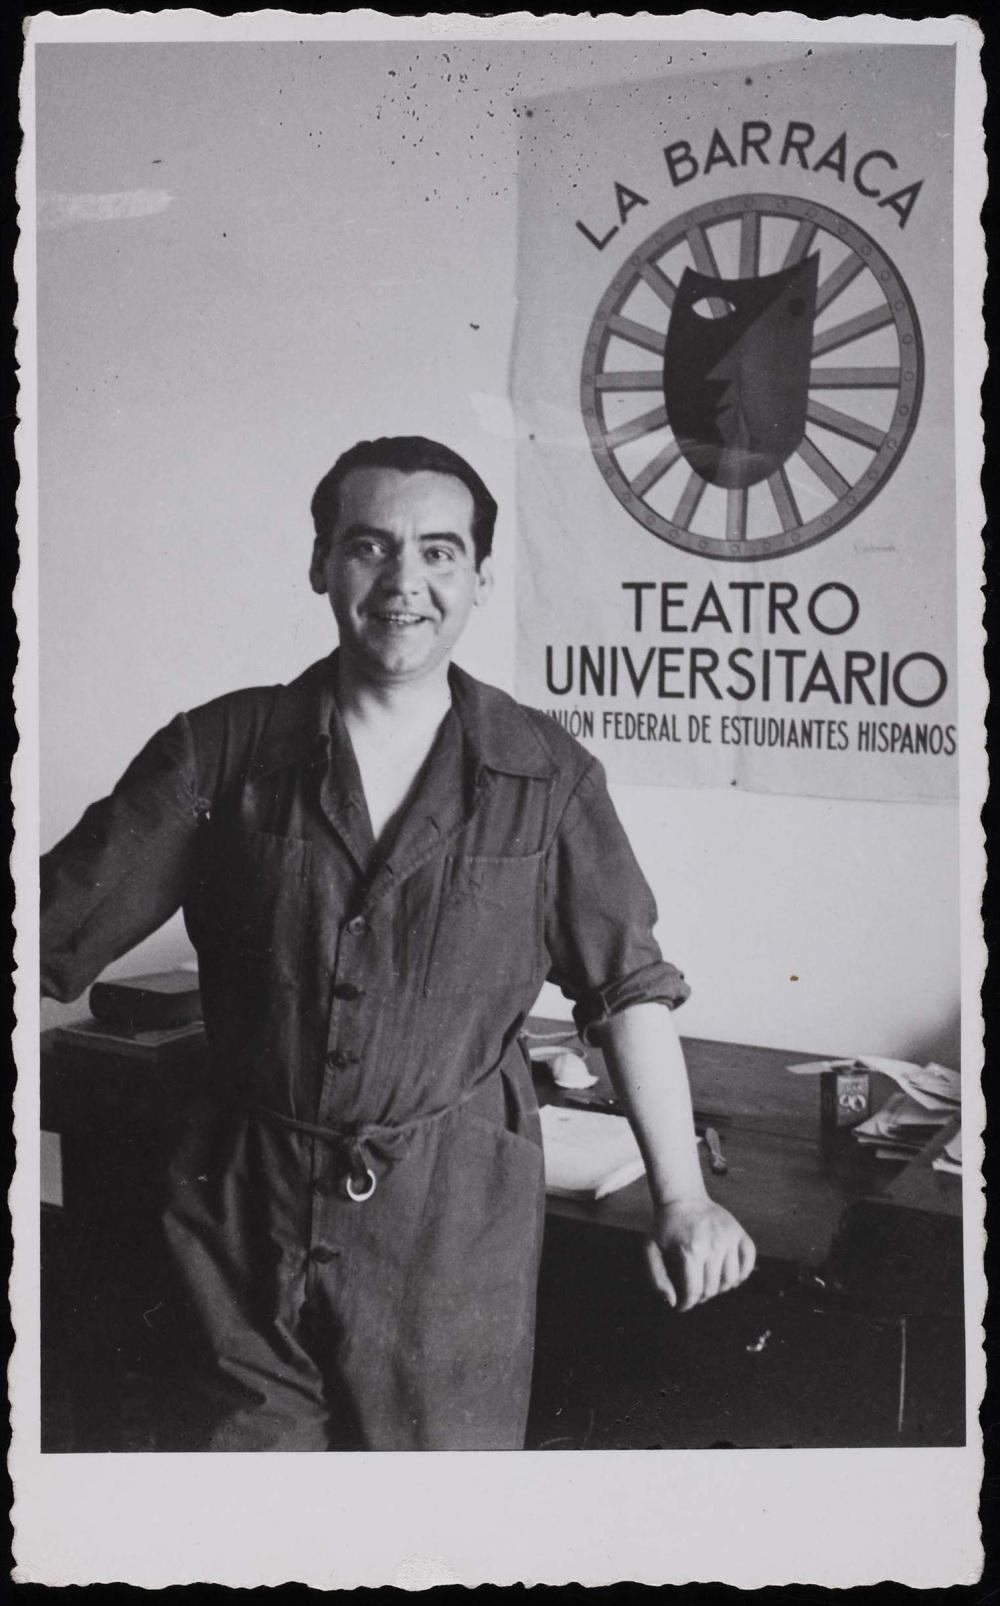 Federico García Lorca. Huerta de San Vicente, Granada. 1932. Museo Nacional Centro de Arte Reina Sofía. Madrid.